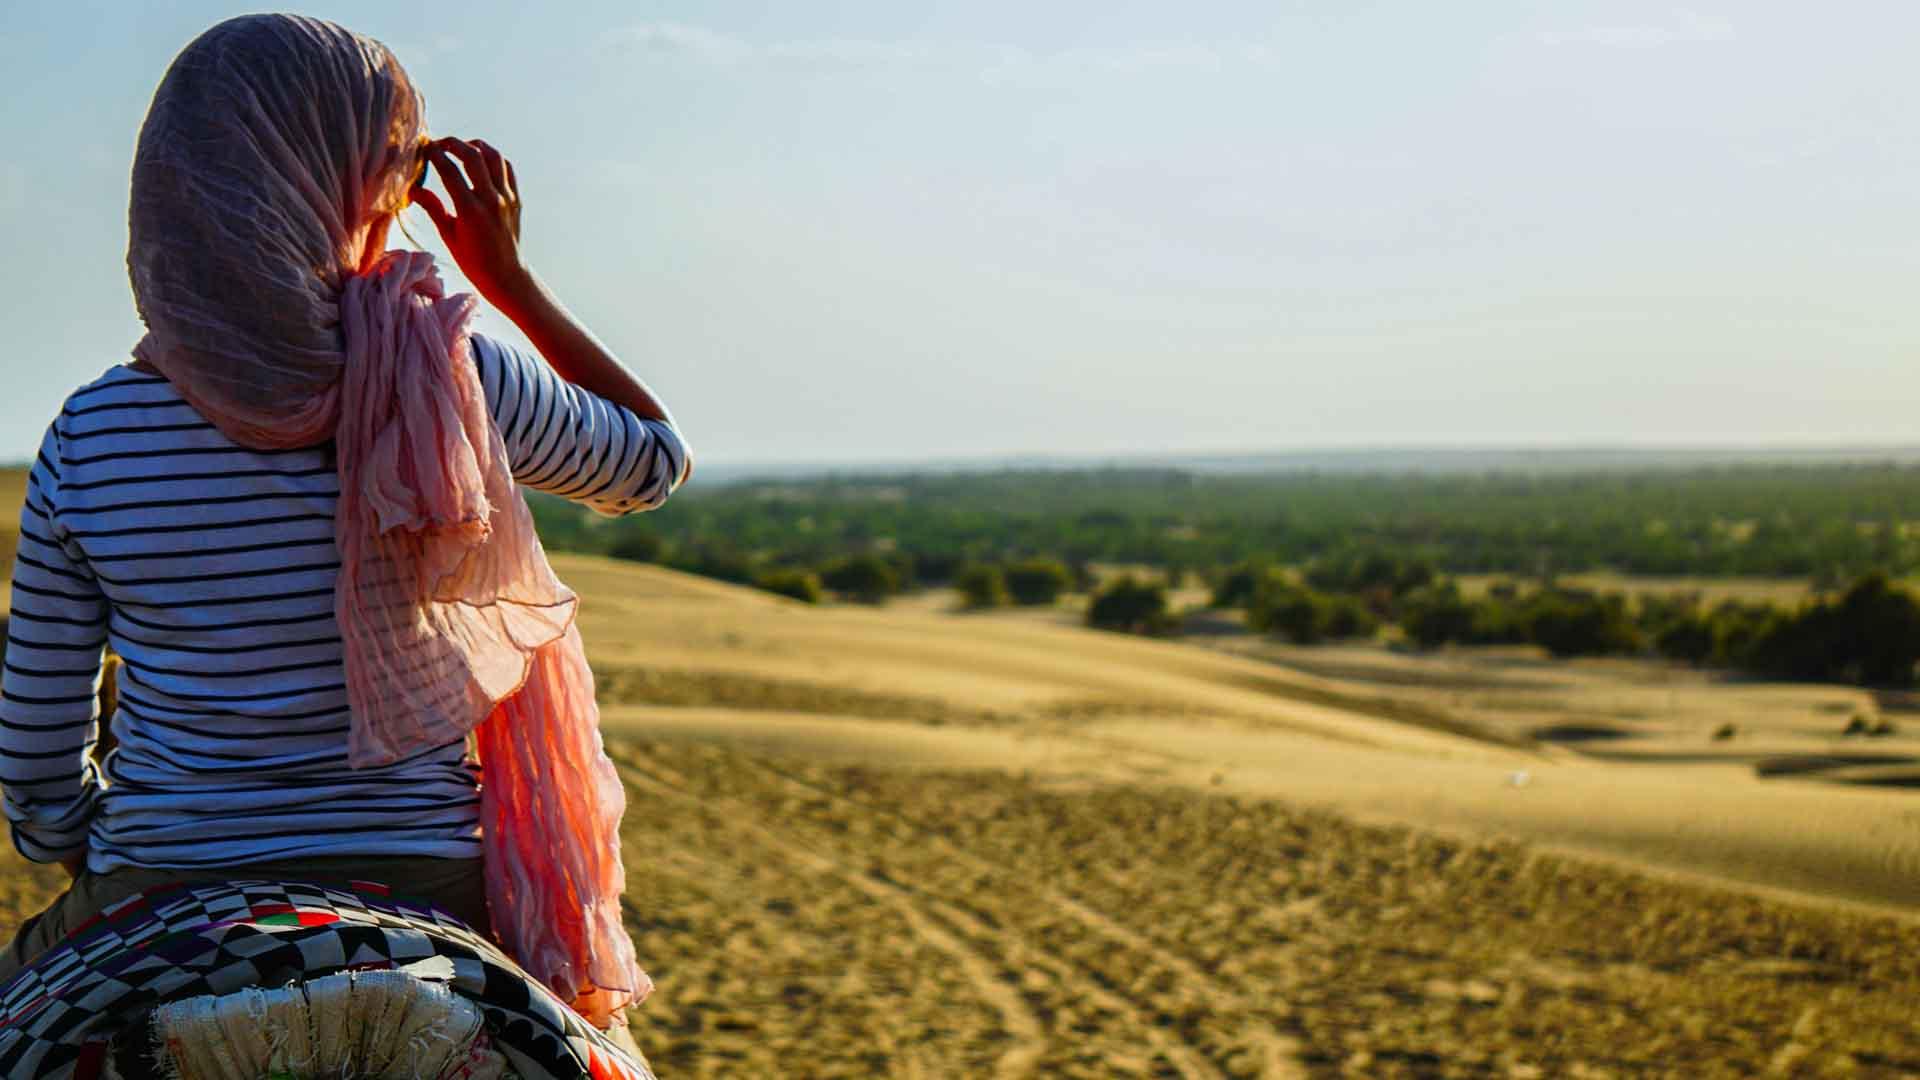 SerialHikers stop autostop world monde tour hitchhiking aventure adventure alternative travel voyage sans avion no fly inde desert féminin women guide baroudeuse adventuress